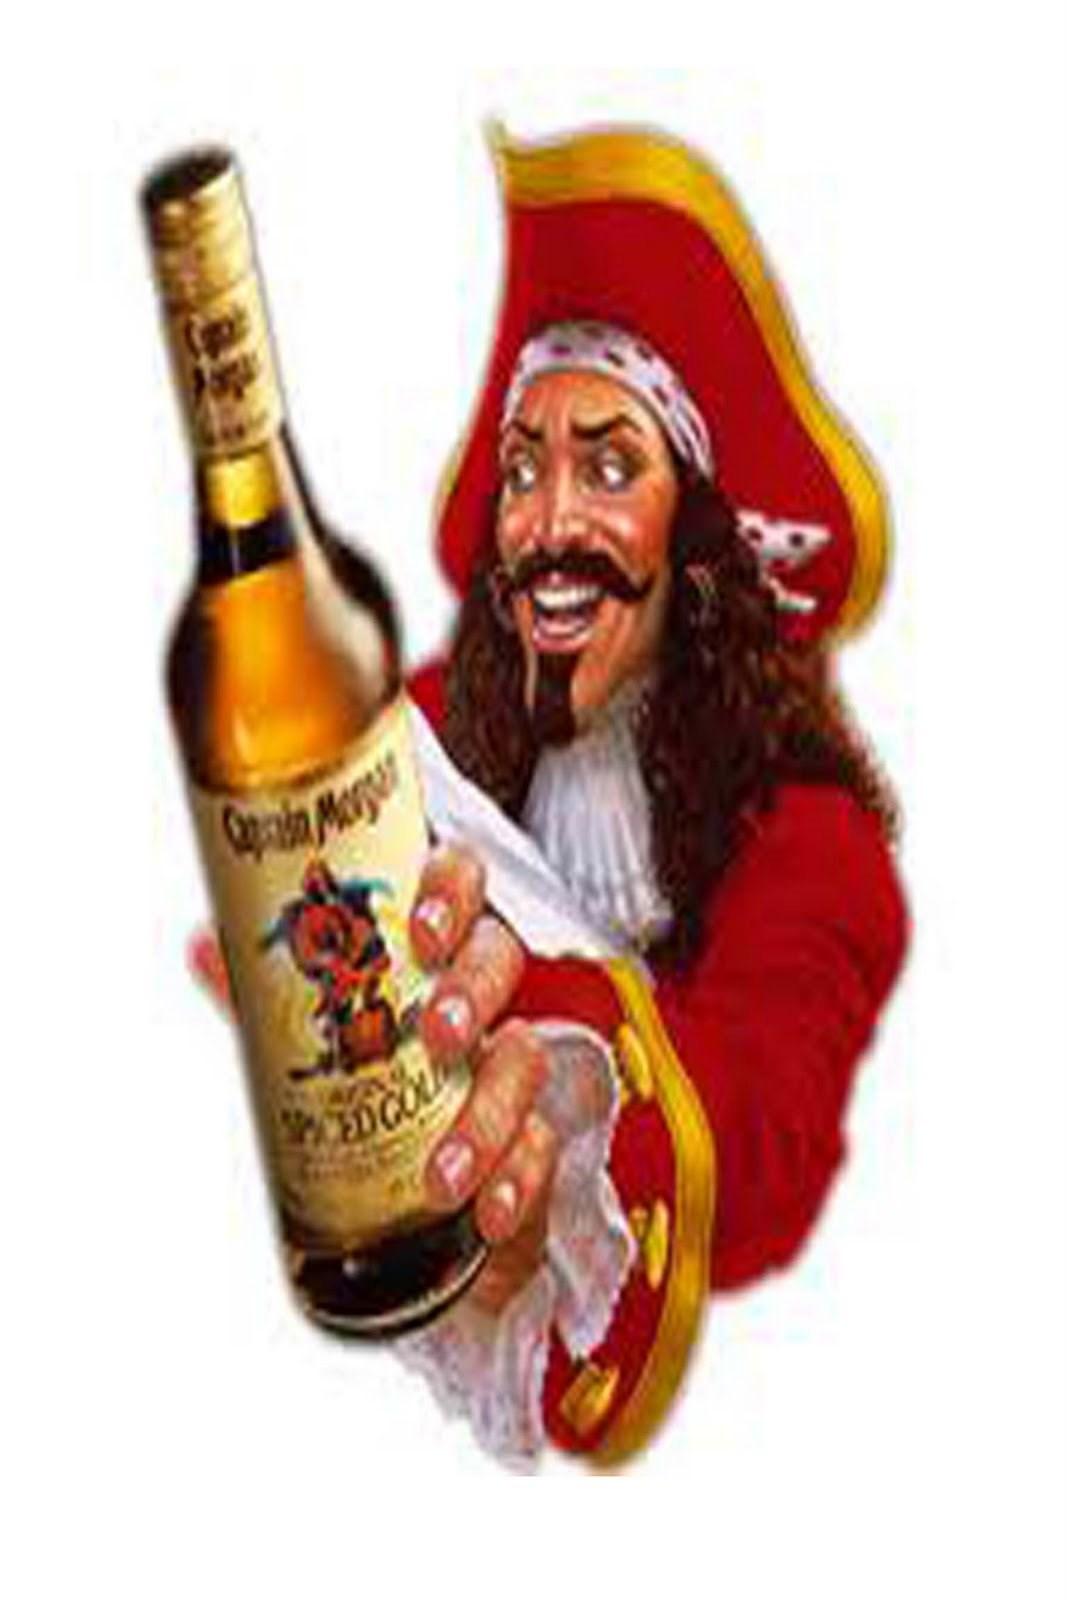 Barman In Red Wallpapers Captain Morgan Desktop Background